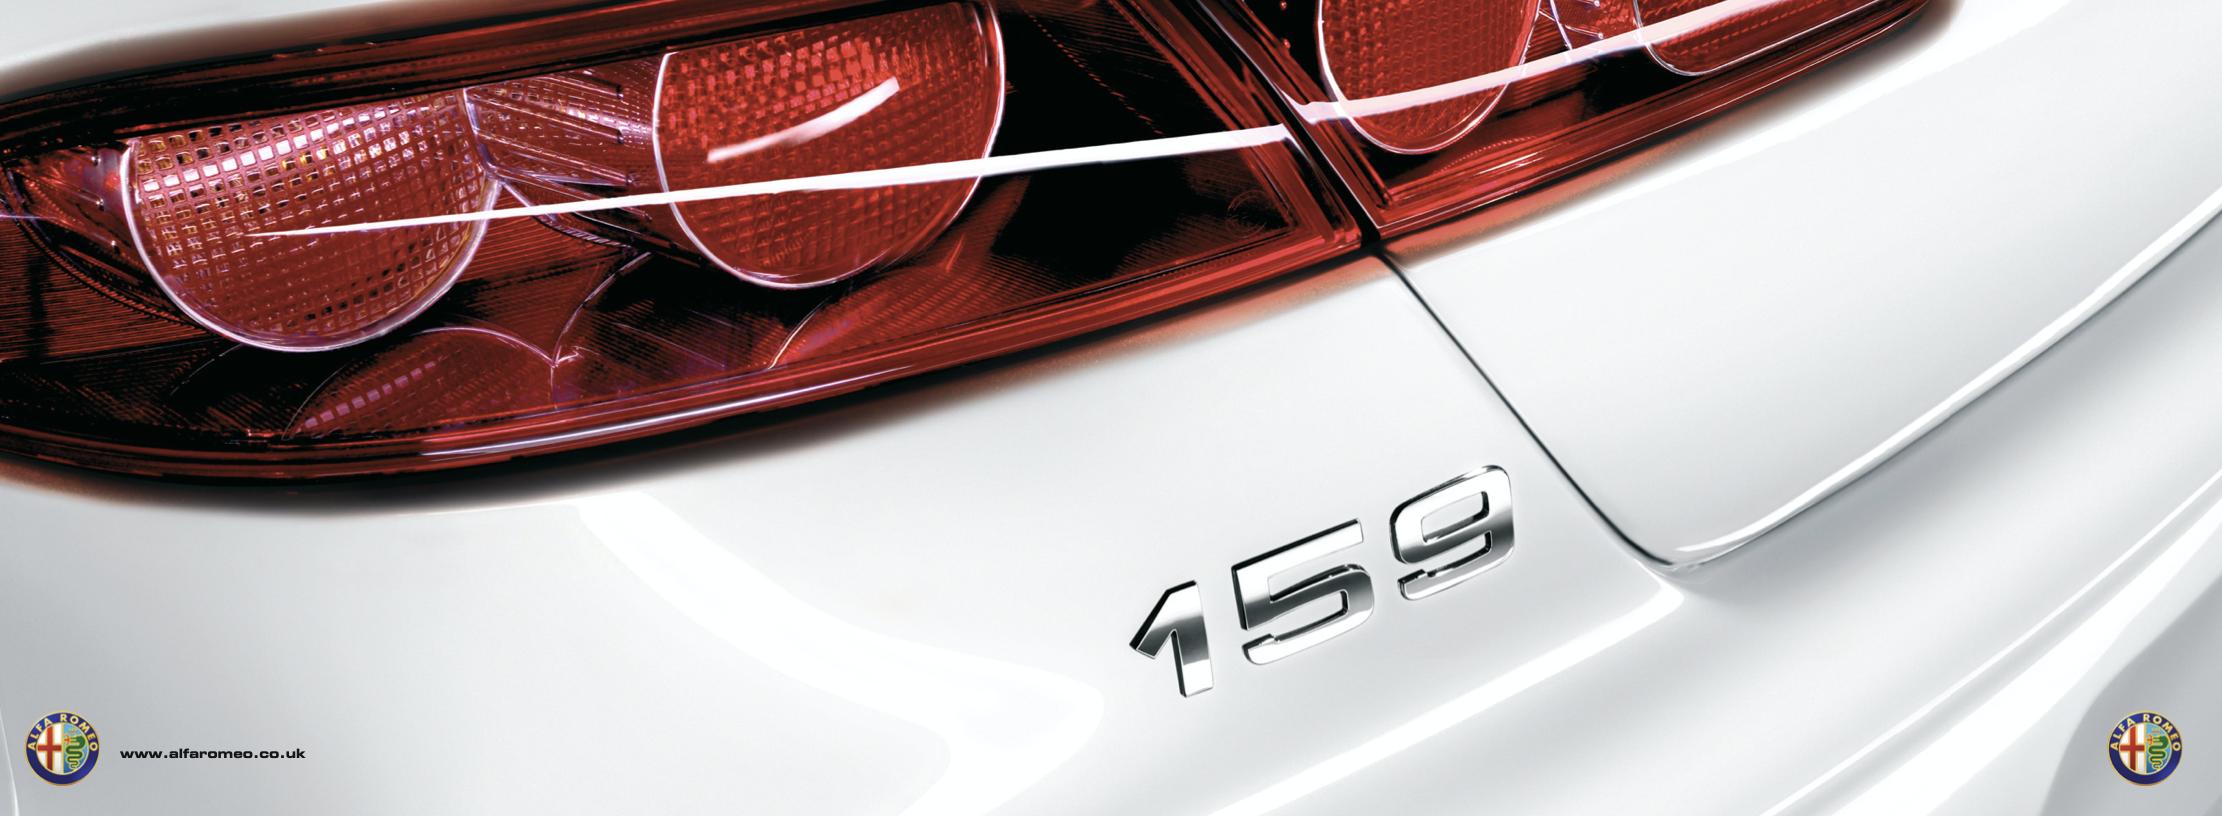 Alfa Romeo 159 brochure